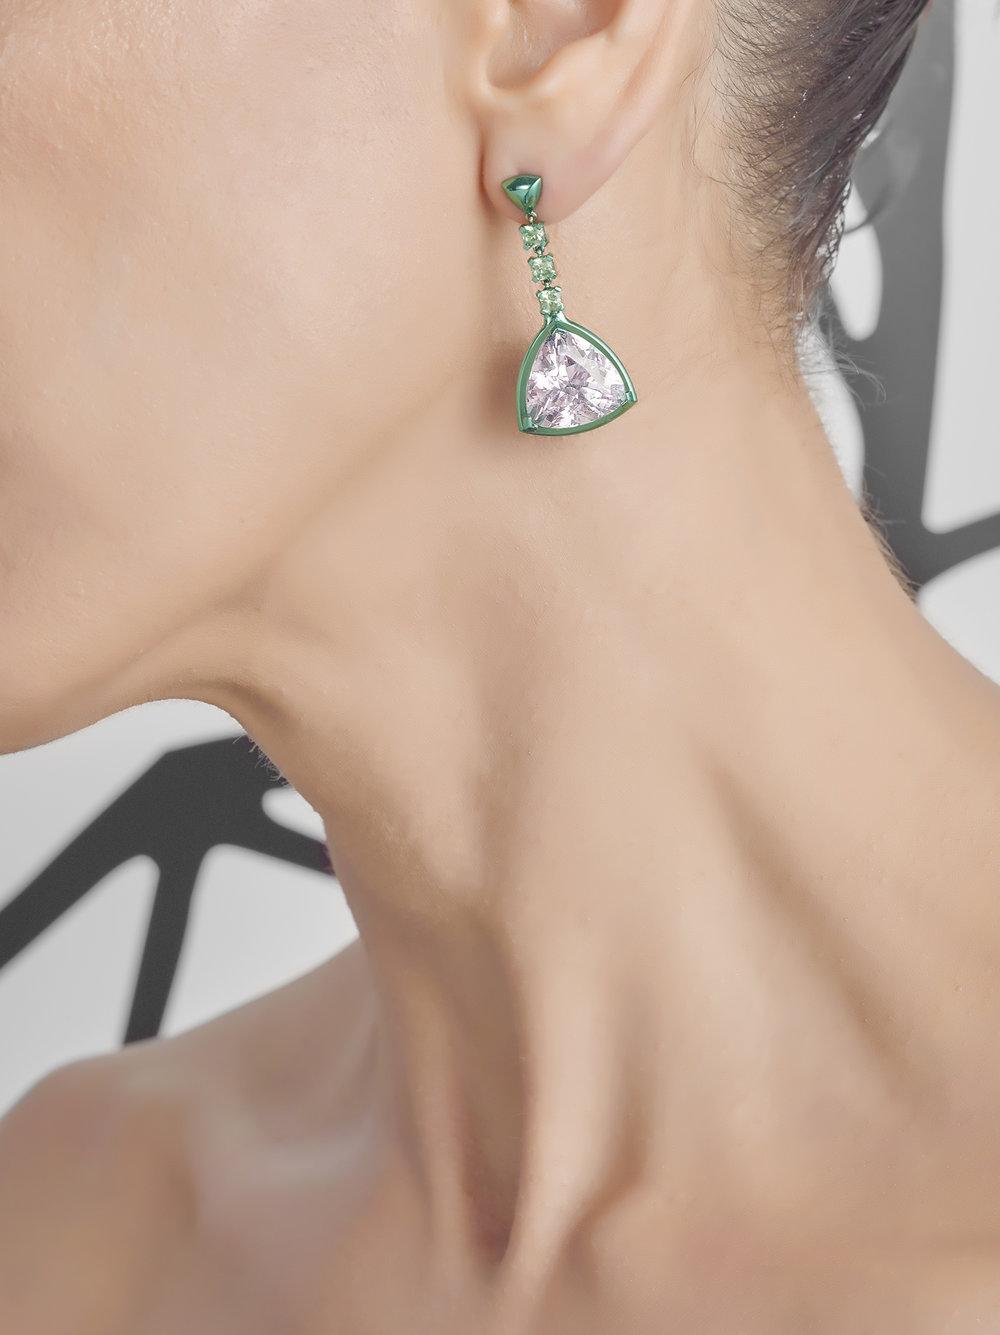 Chromanteq Kunzite Morganite and Demantoid Earrings Kunzite Close Up.jpg